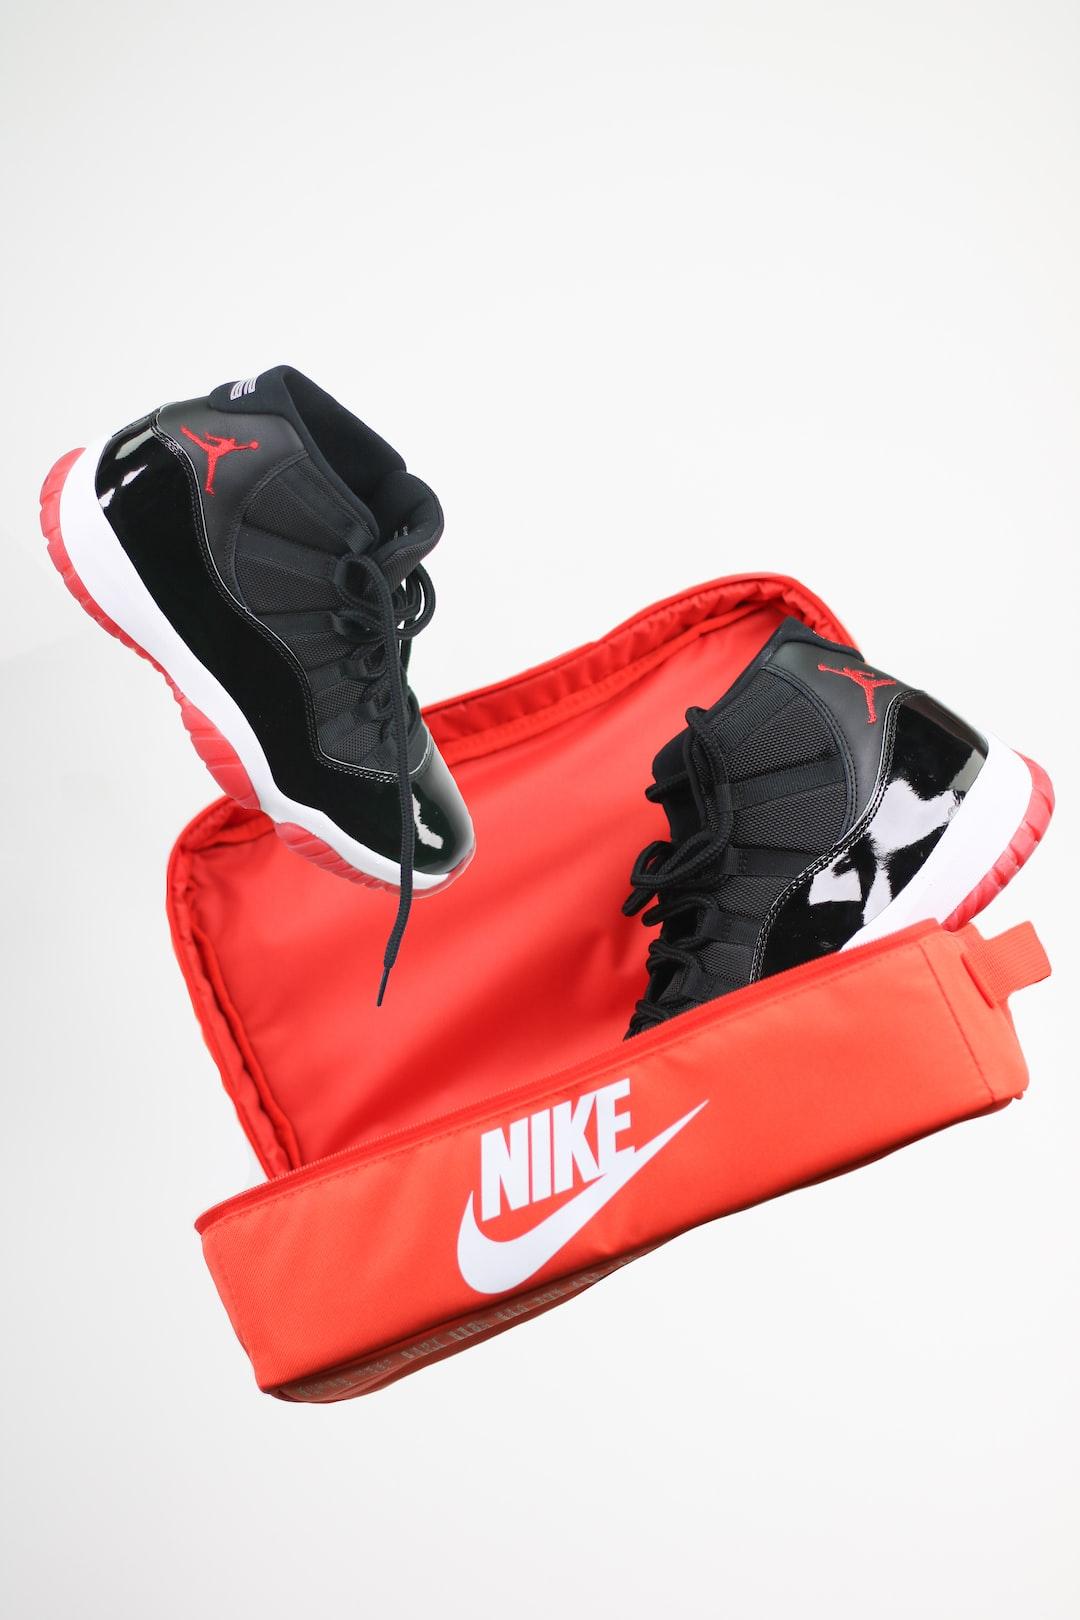 Nike promotional product shoot